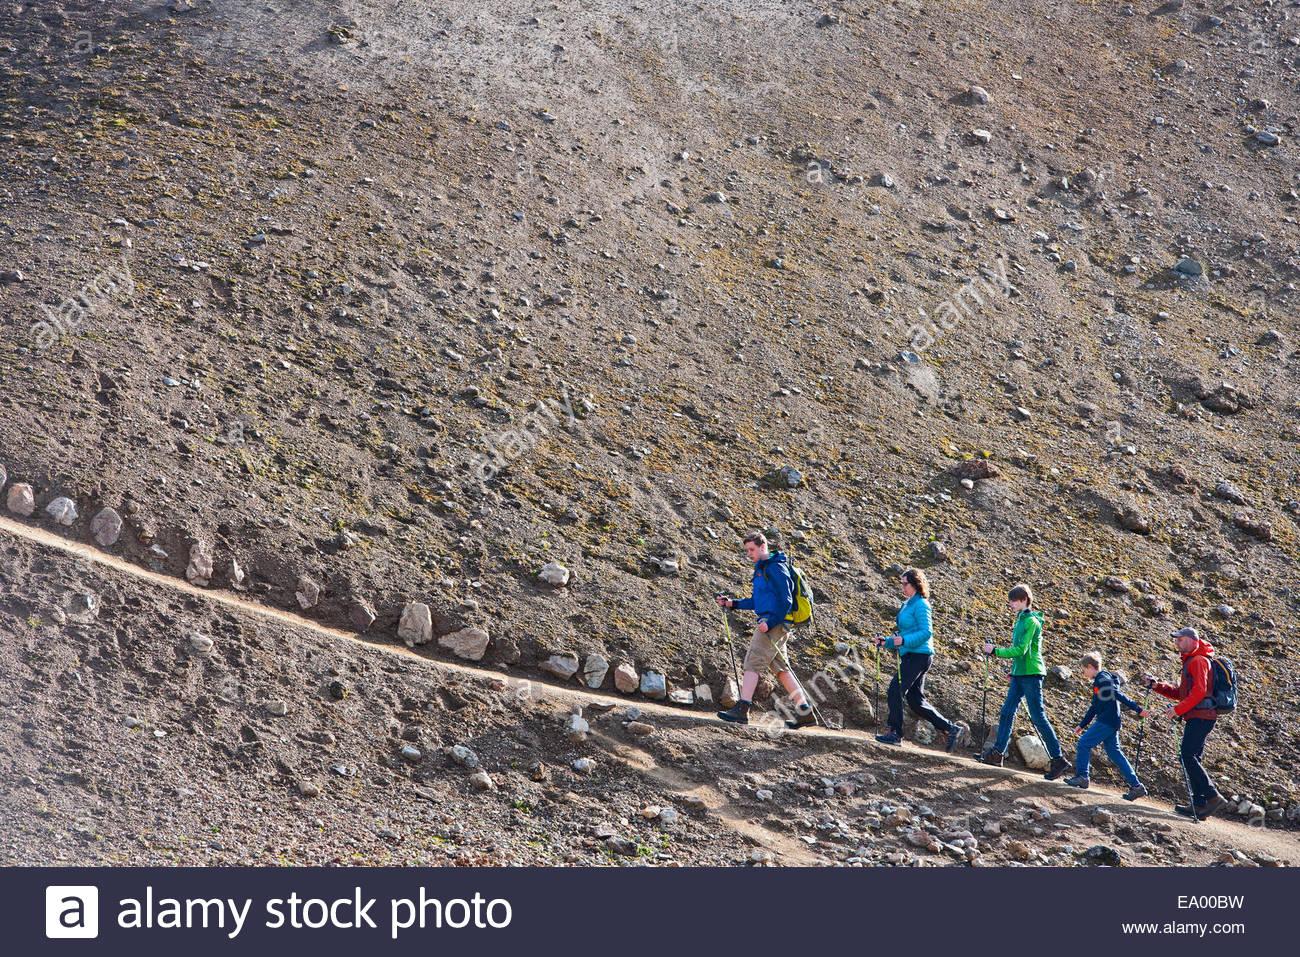 Family walking up a hill at Landmannalaugar, Fjallabak, Iceland - Stock Image